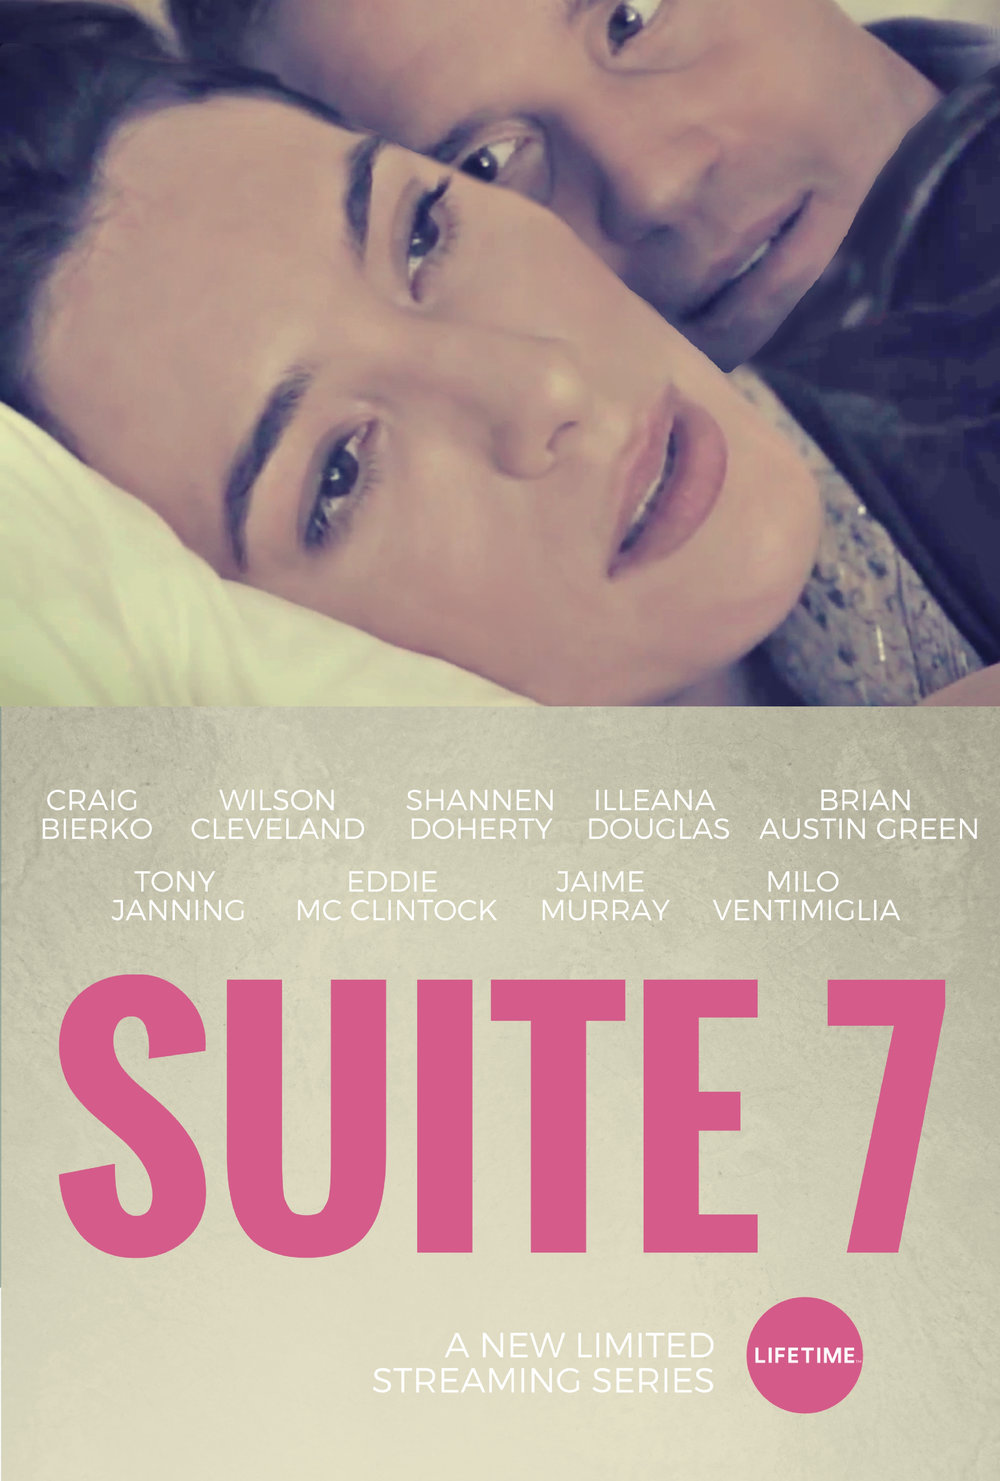 suite 7 poster-imdb.jpg